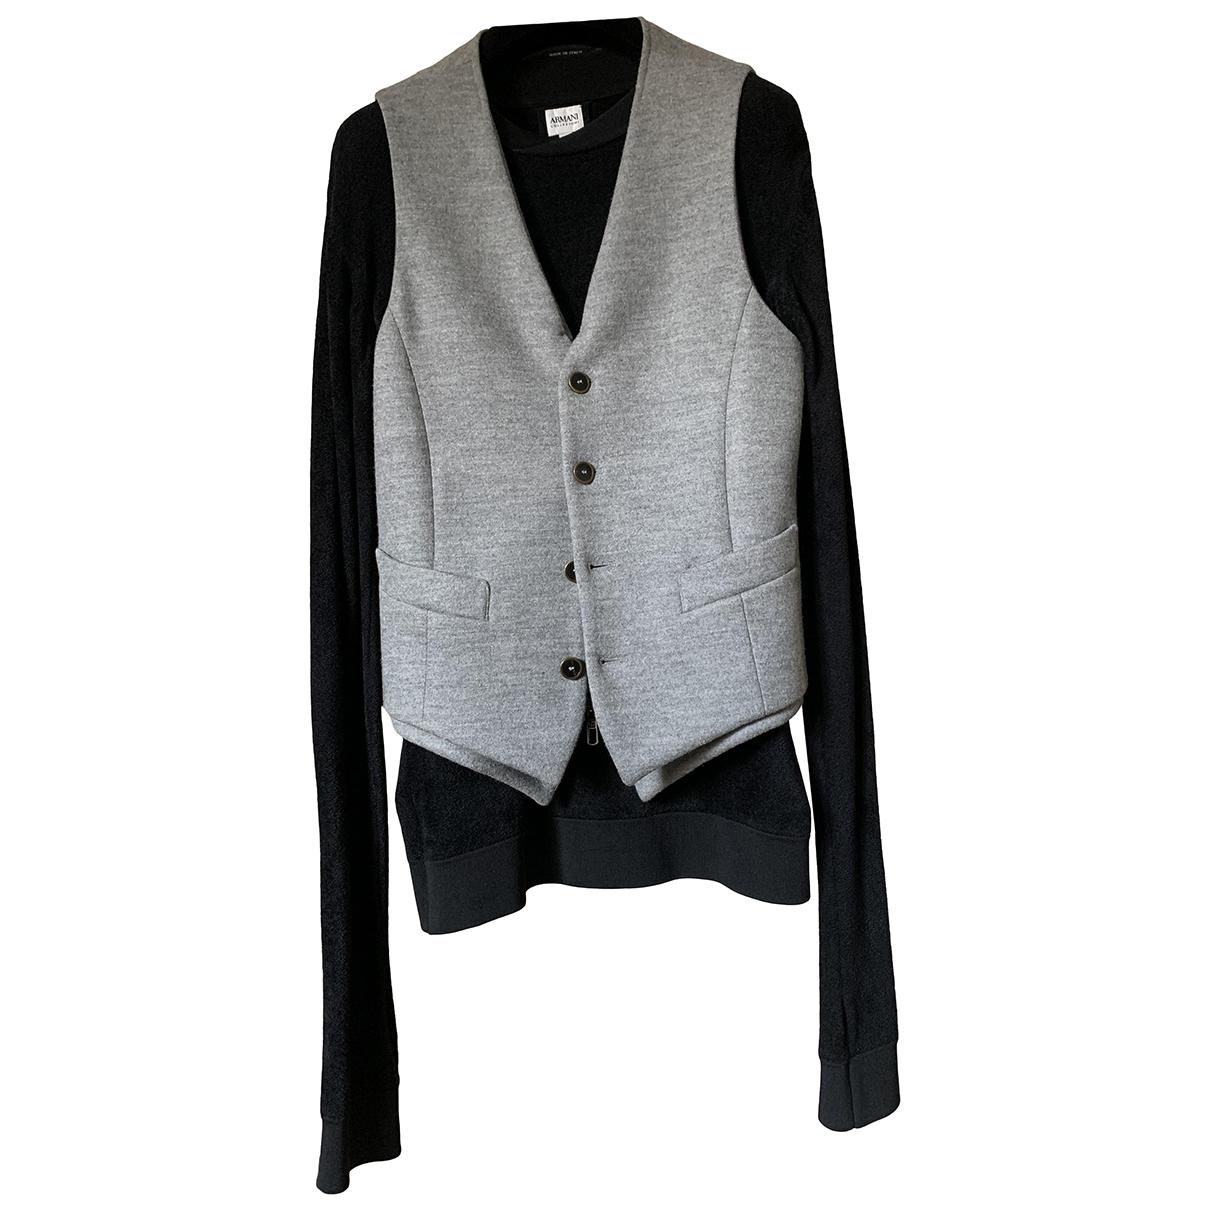 Giorgio Armani \N Jacke in  Grau Wolle